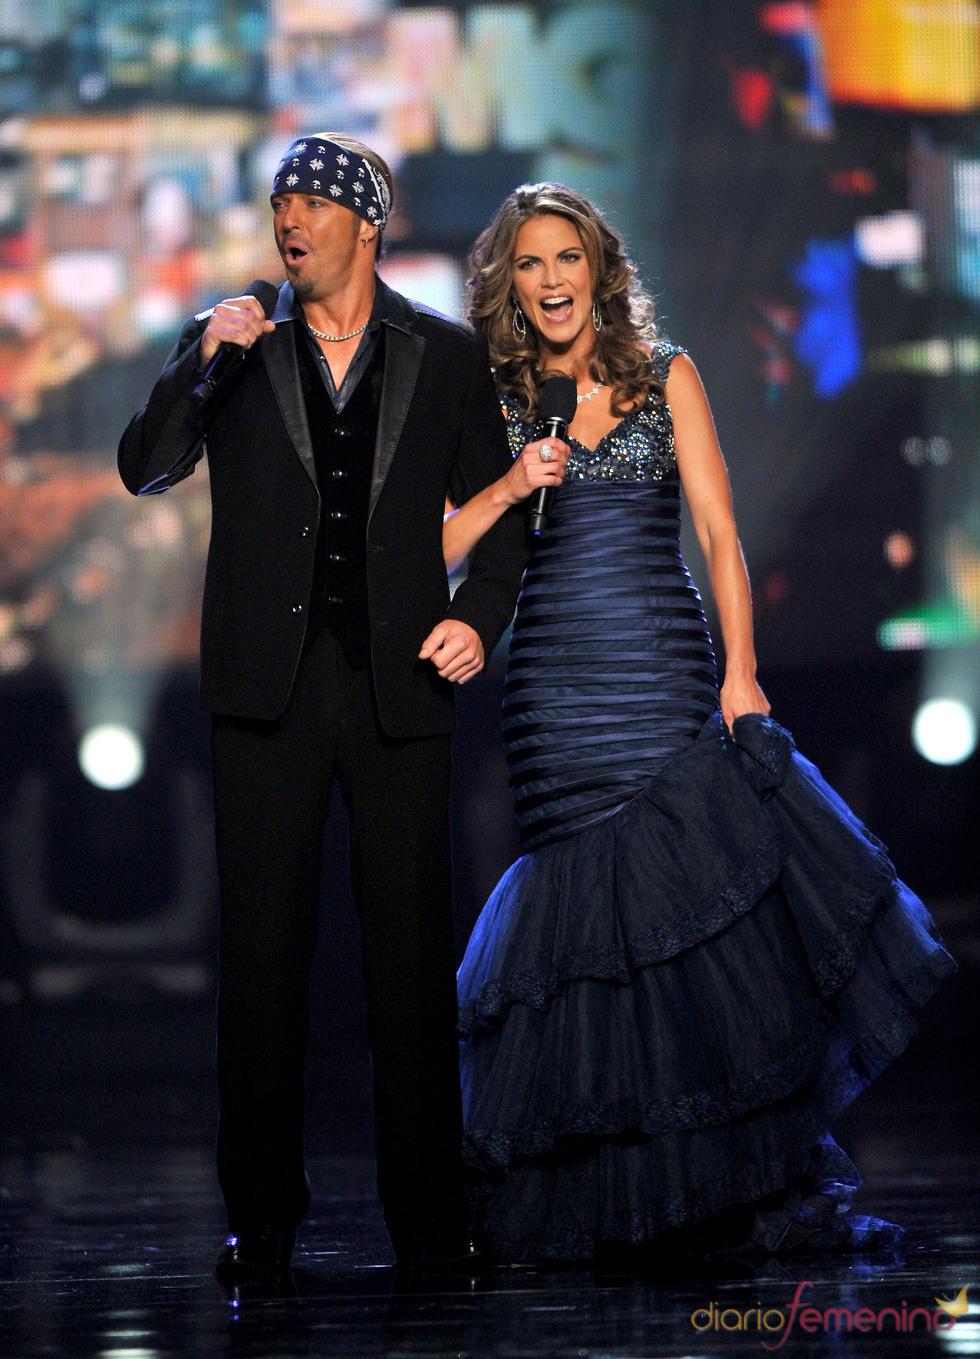 Bret Michaels y Natalie Morales en la gala Miss Universo 2010